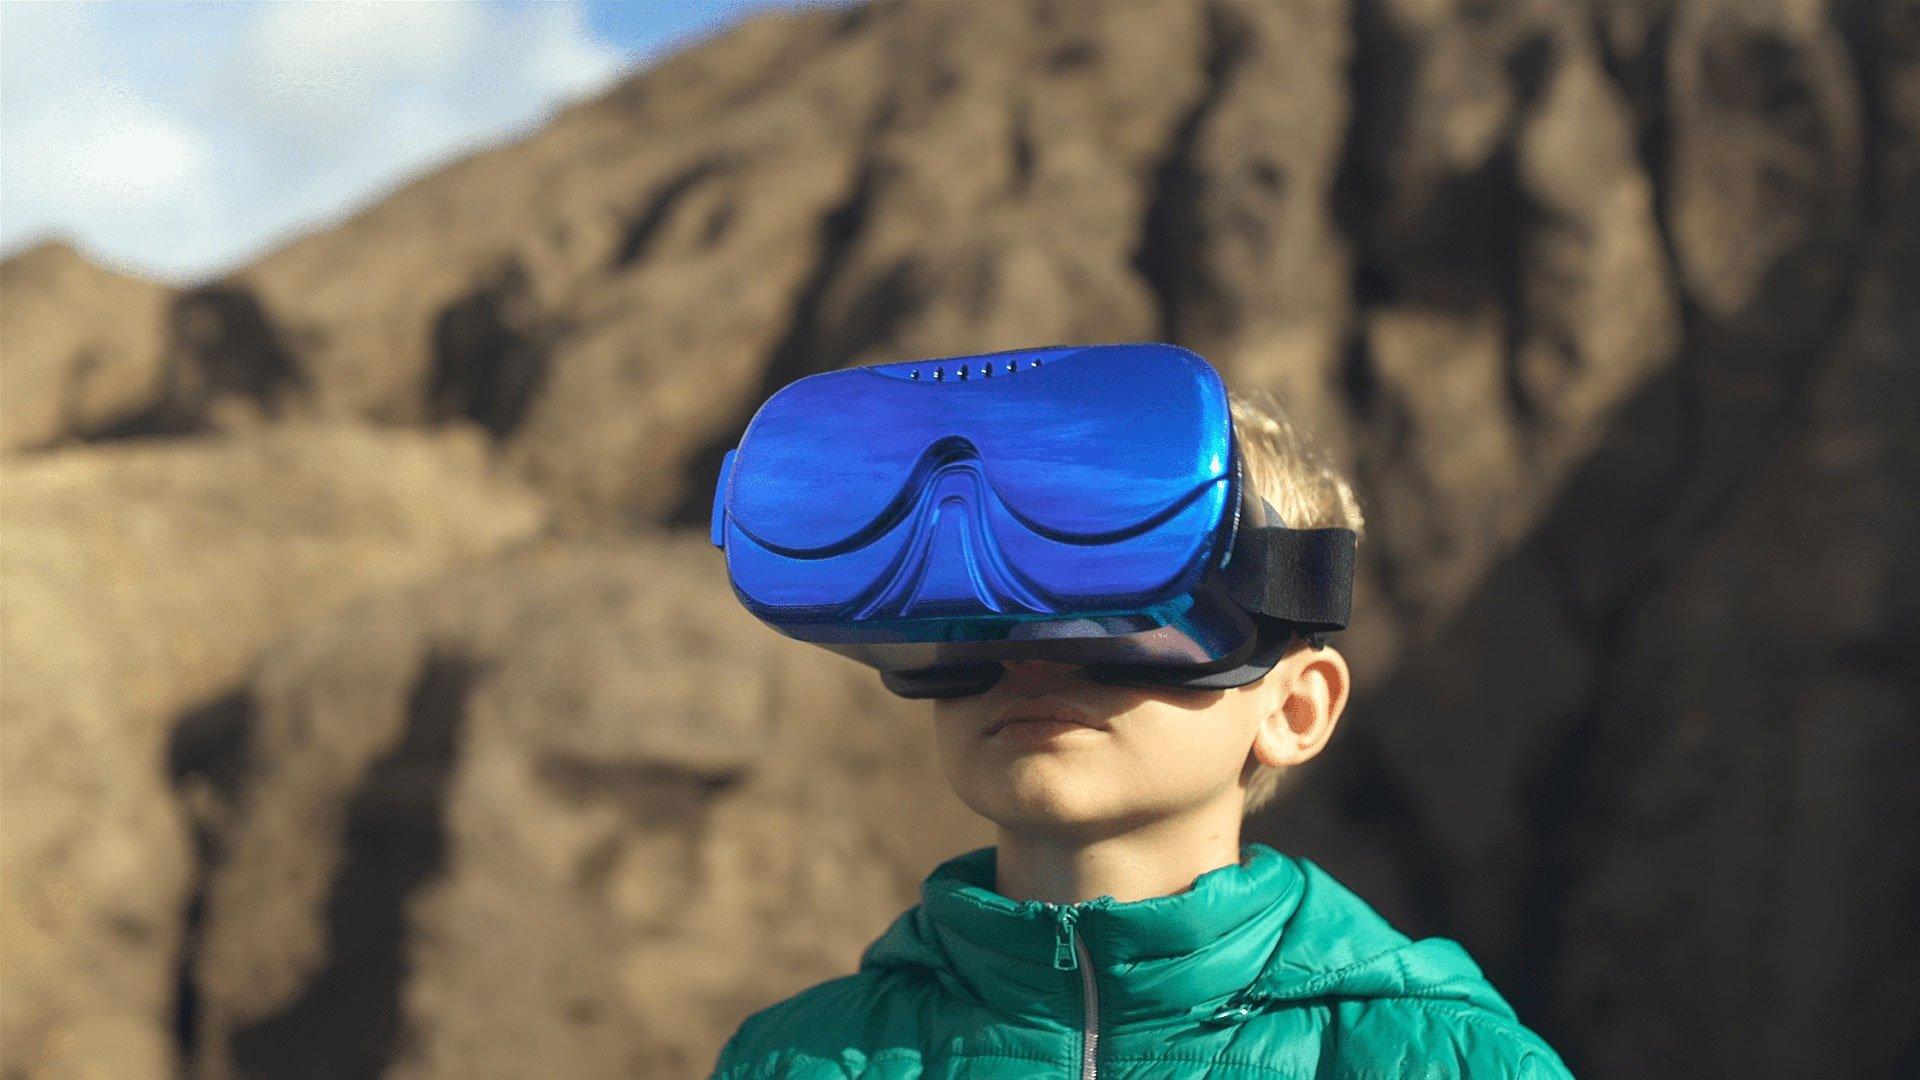 Elias trägt eine blaue Virtual-Reality Brille